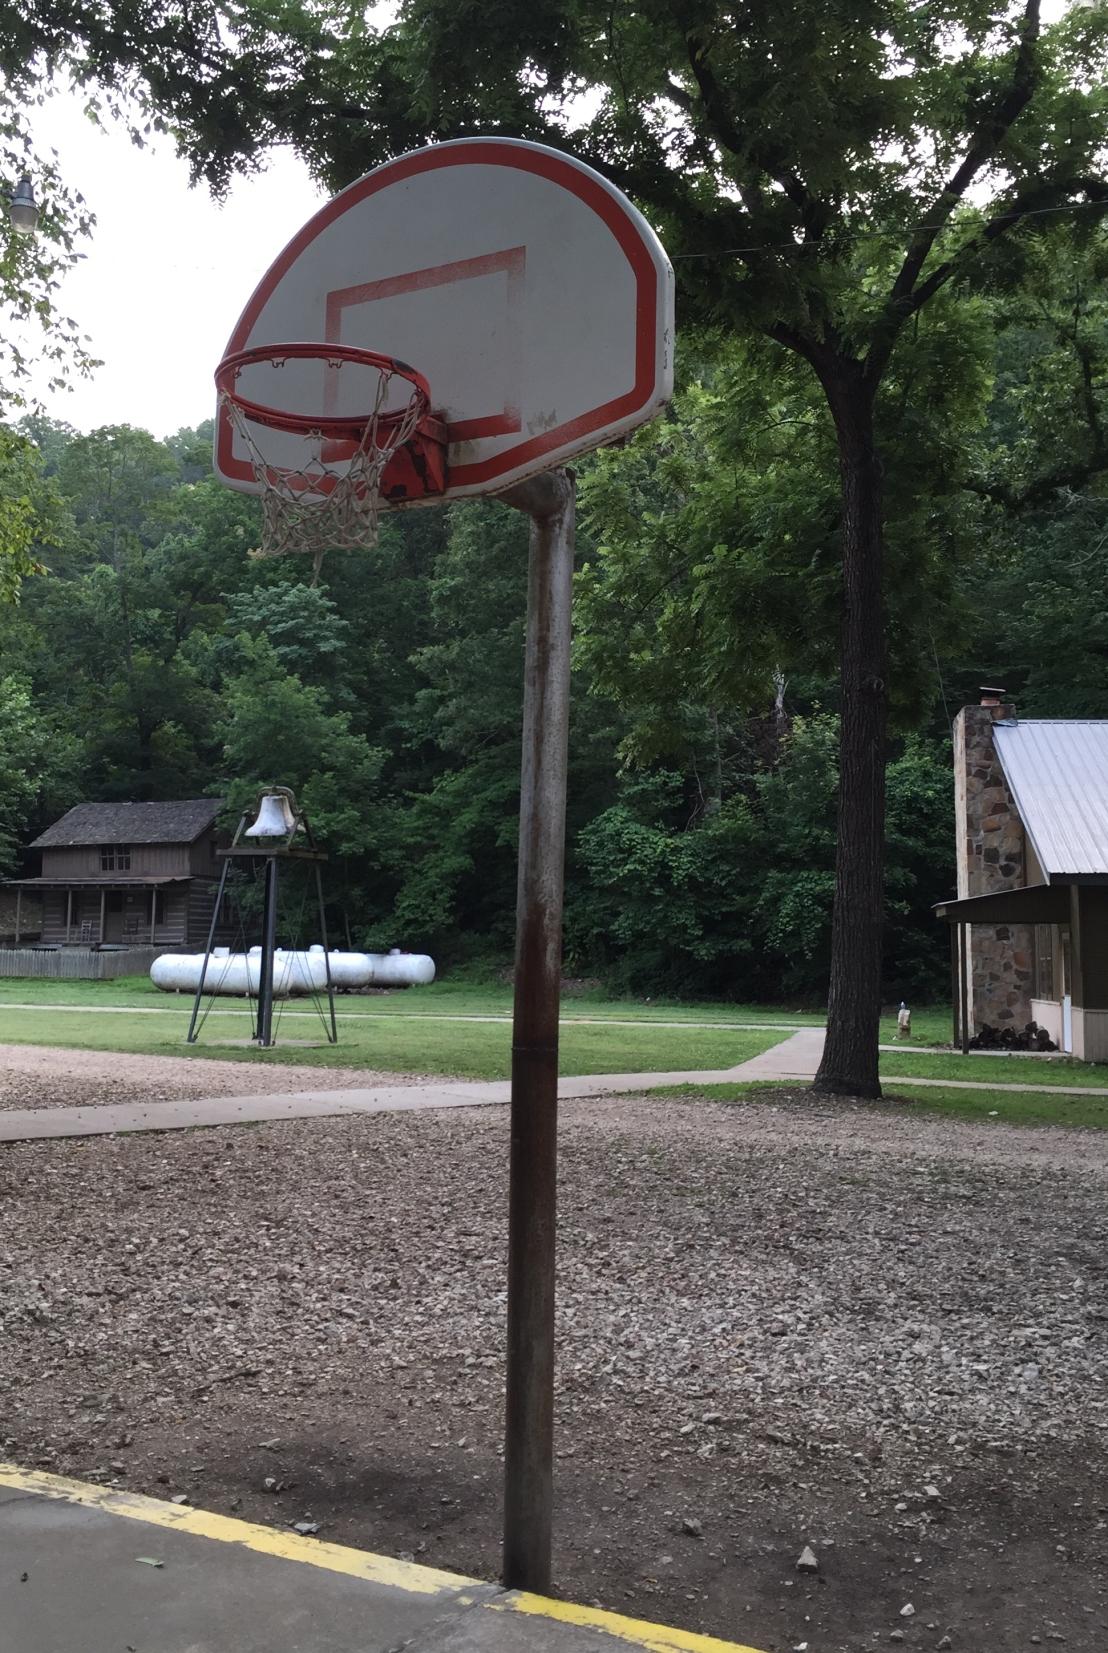 basketfall goal